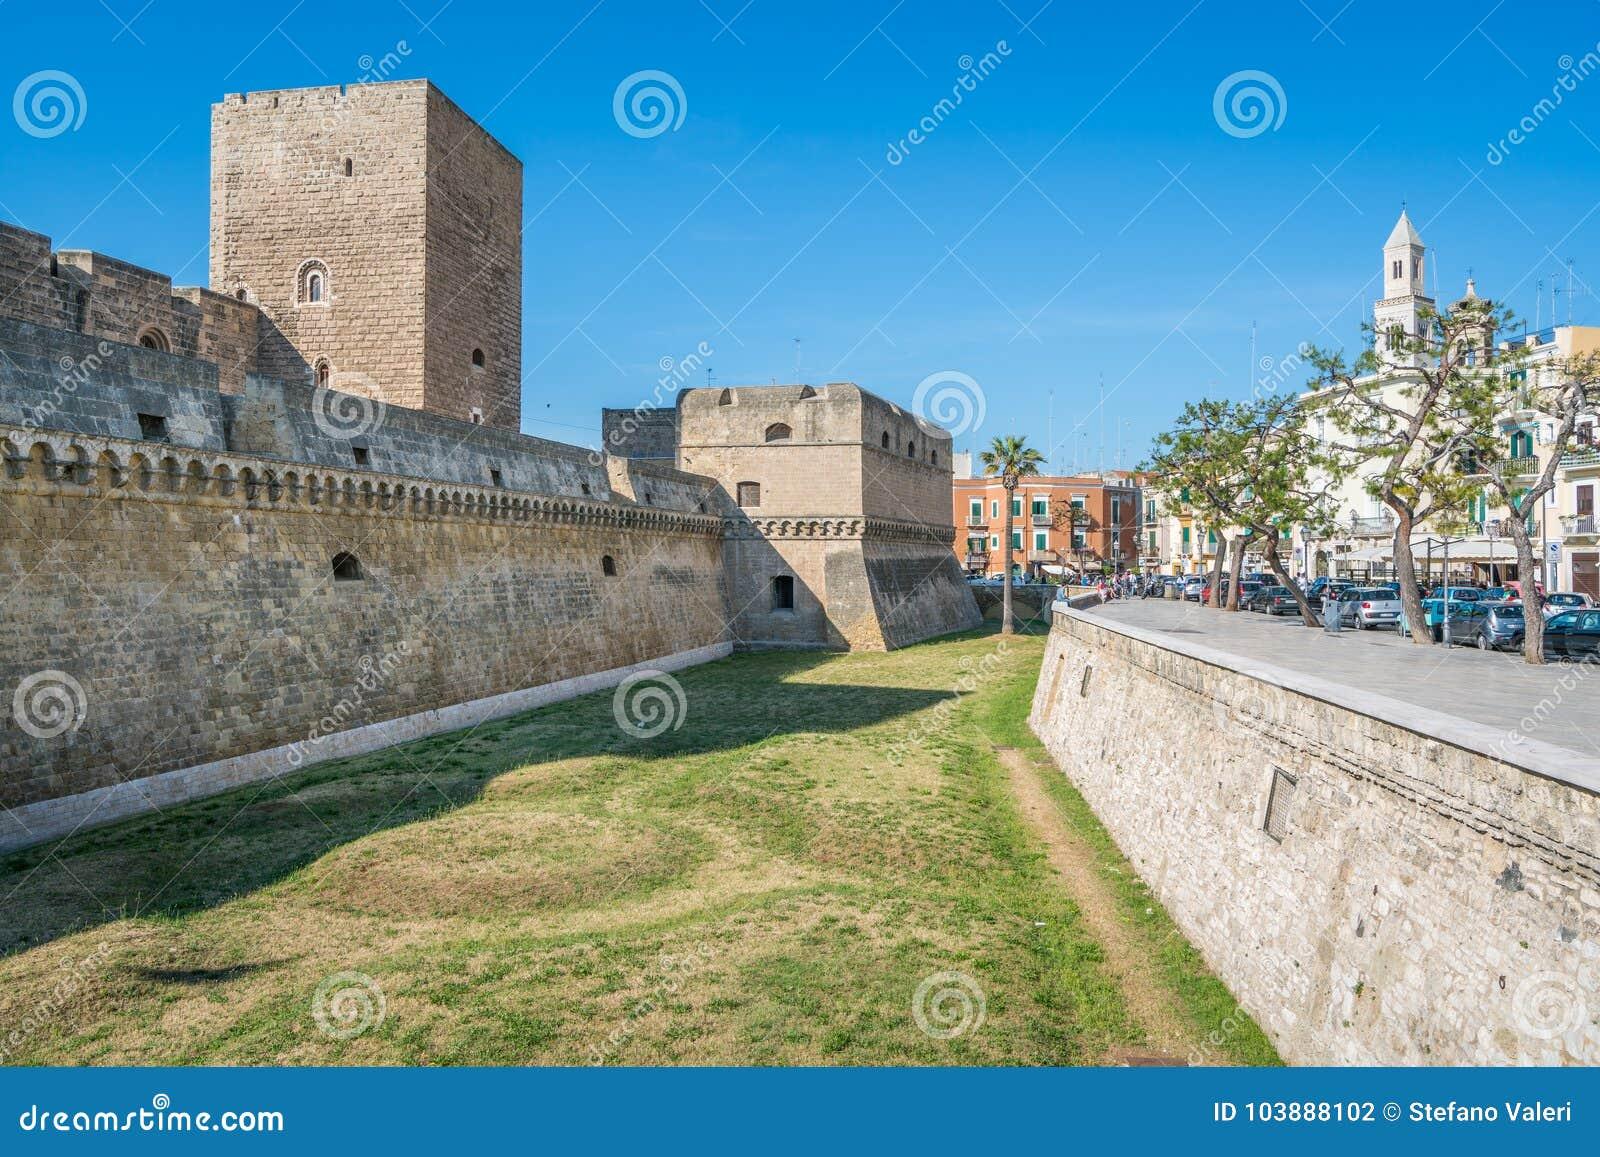 Castello Svevo德国的兹瓦本地方城堡在巴里,普利亚,南意大利